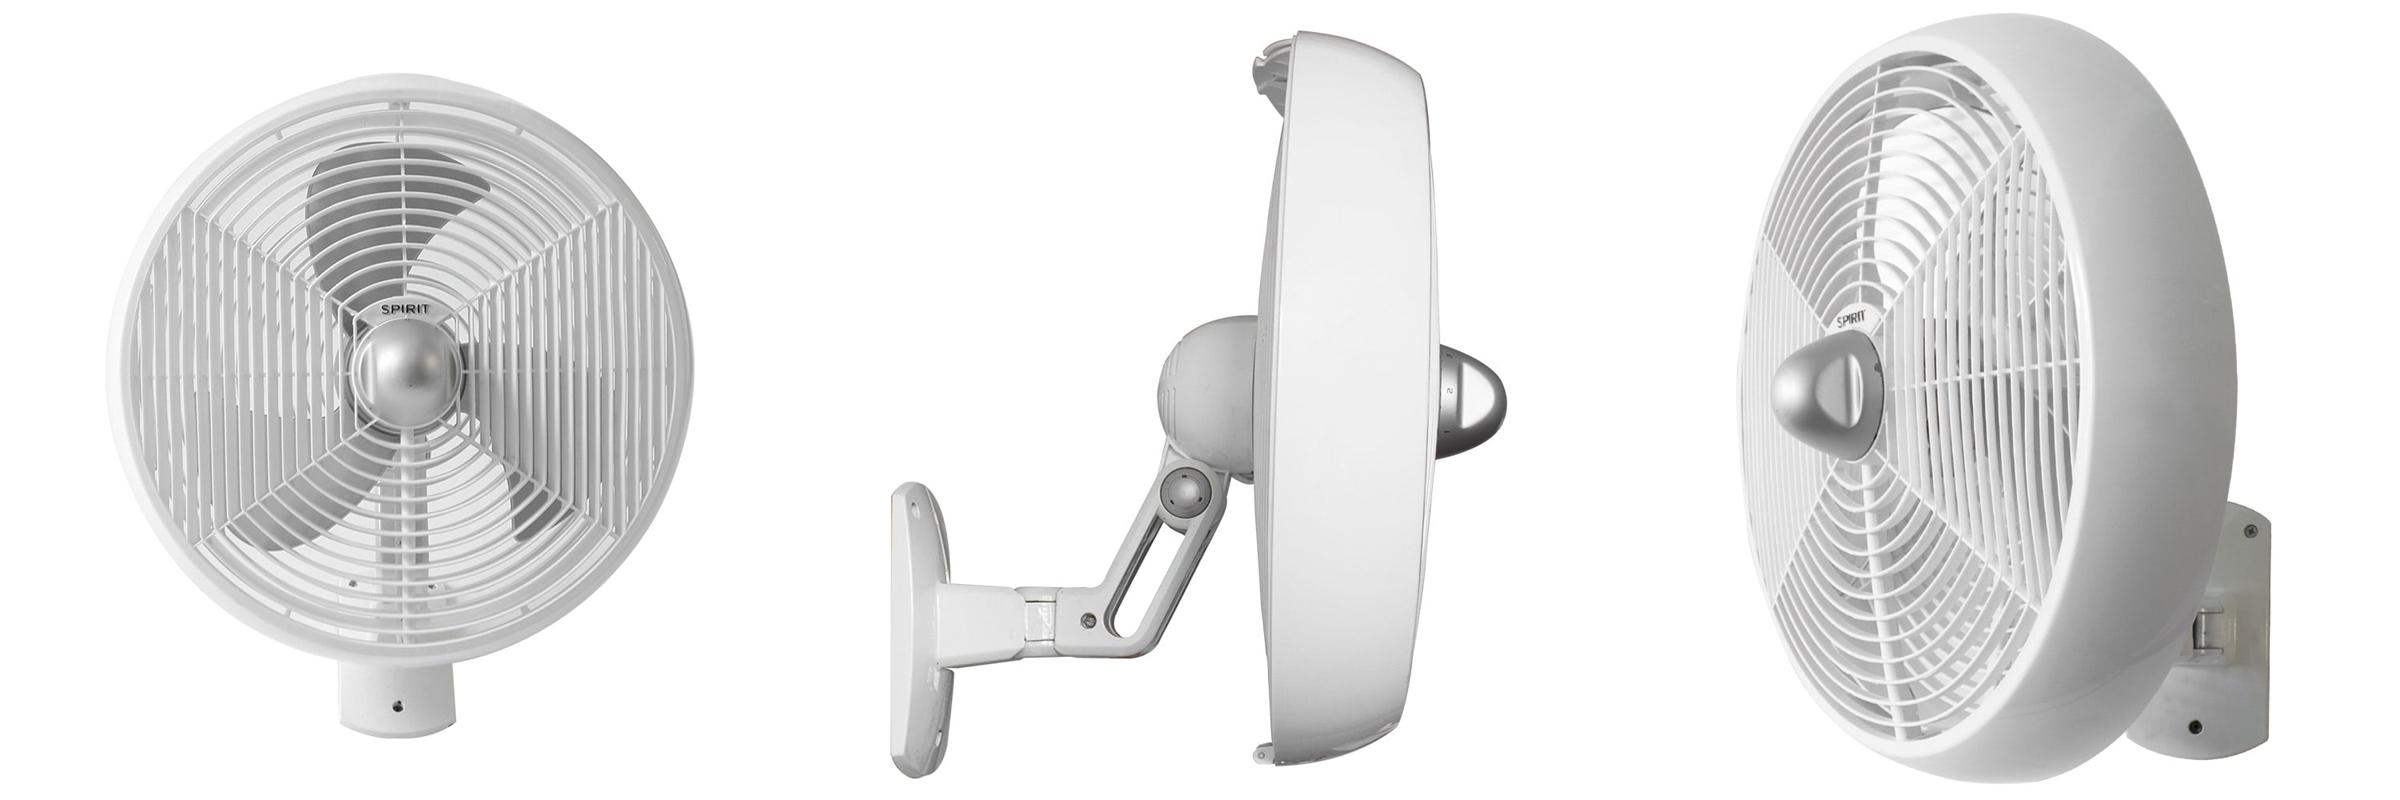 ventilador de teto Spirit - Blog Myspirit - Ventilador de Parede SPIRIT Maxximos 40cm White Steel - ventilador de parede Spirit - ventilador de parede